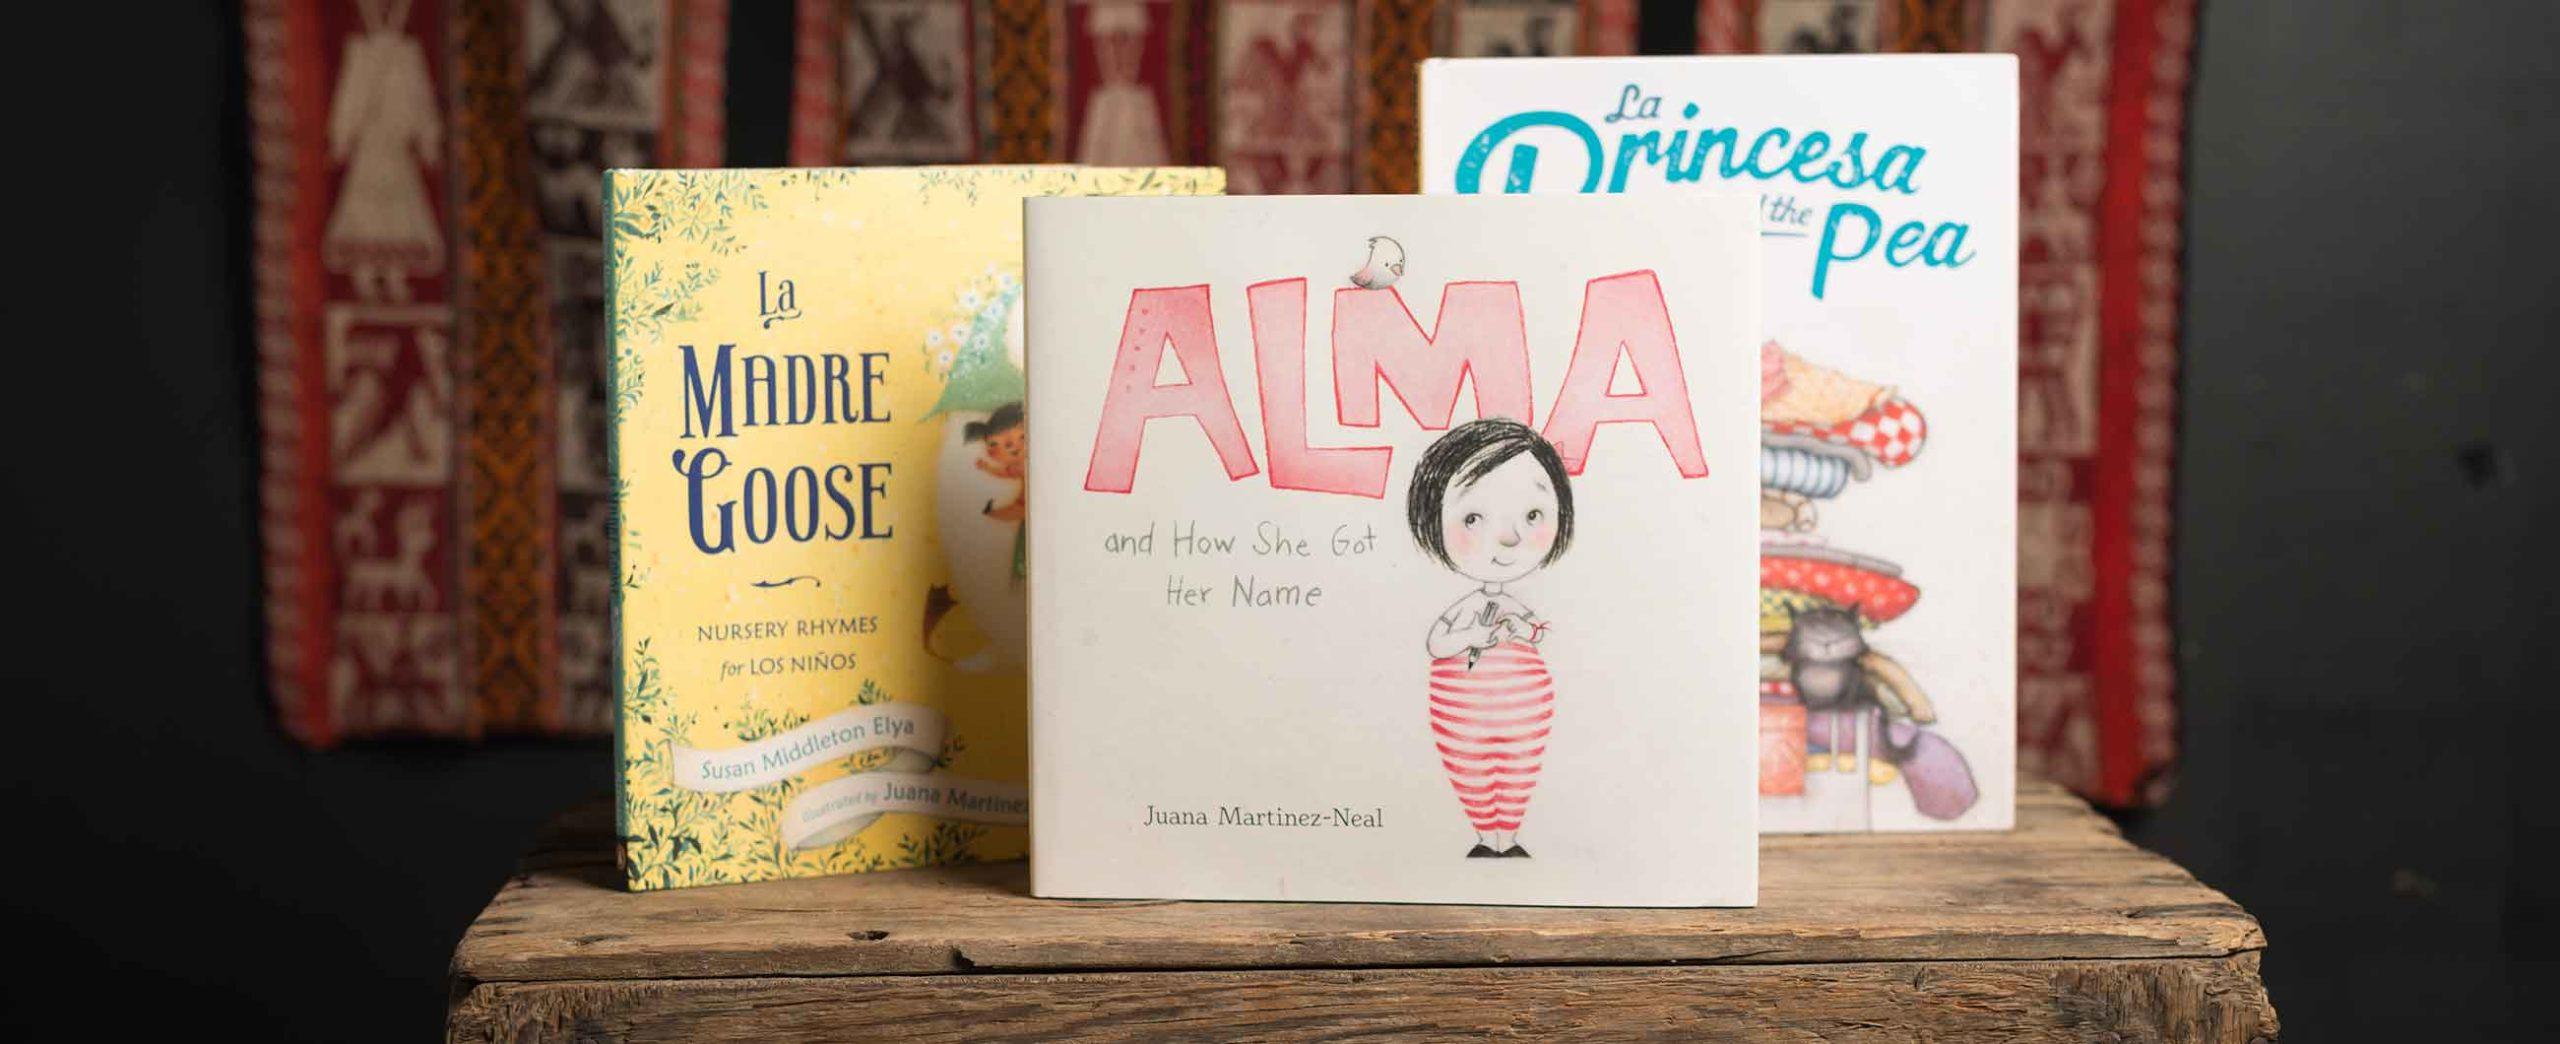 Books by Juana Martinez-Neal